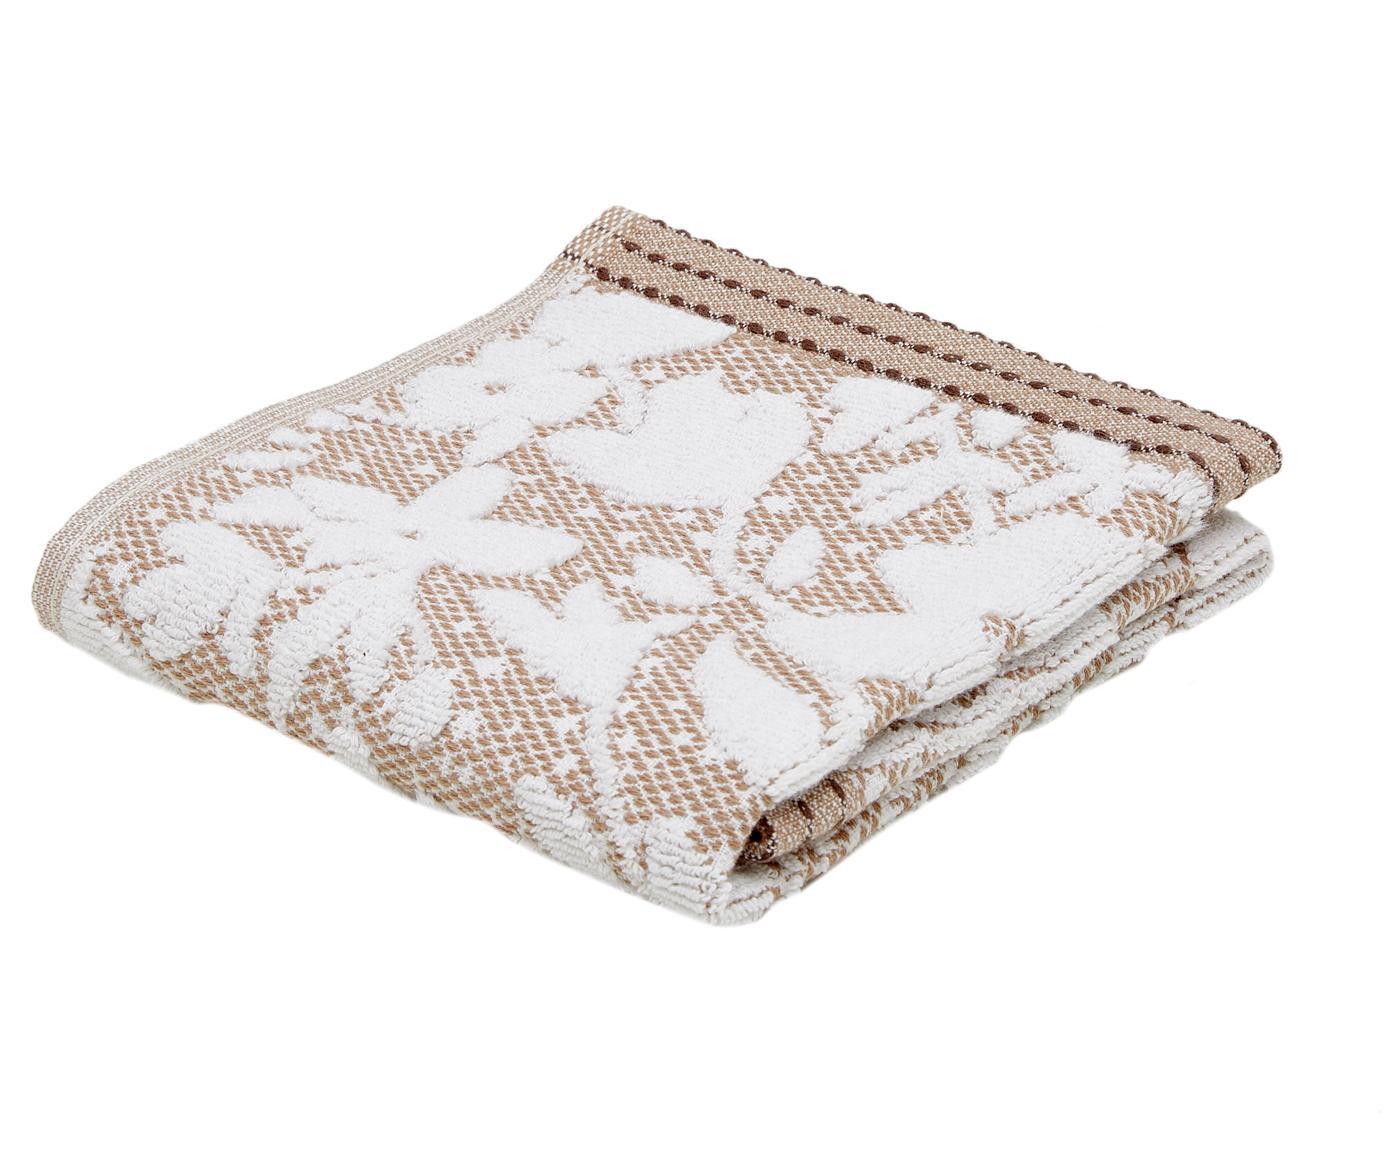 Asciugamano con motivo floreale Matiss, Bianco, taupe, Larg. 30 x Lung. 50 cm